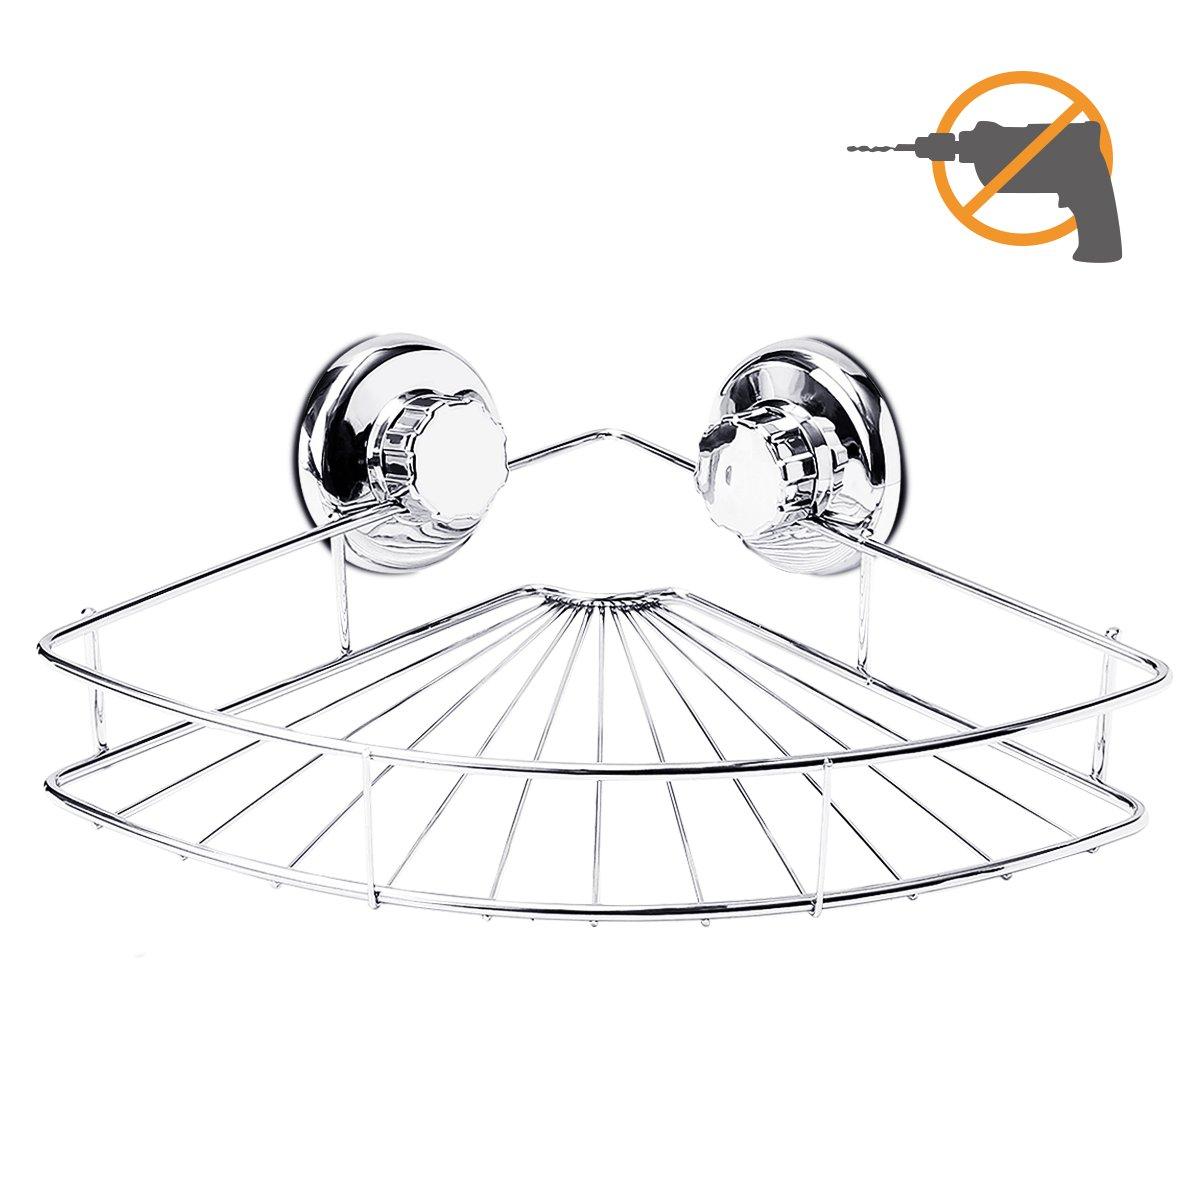 Shower Corner Caddy, TAPCET Shower Shelf Bathroom Shelf Shower Corner Basket with Suction Cup, Wall Mounted Shower Caddy Stainless Steel Bath Shelf, Polished Chrome